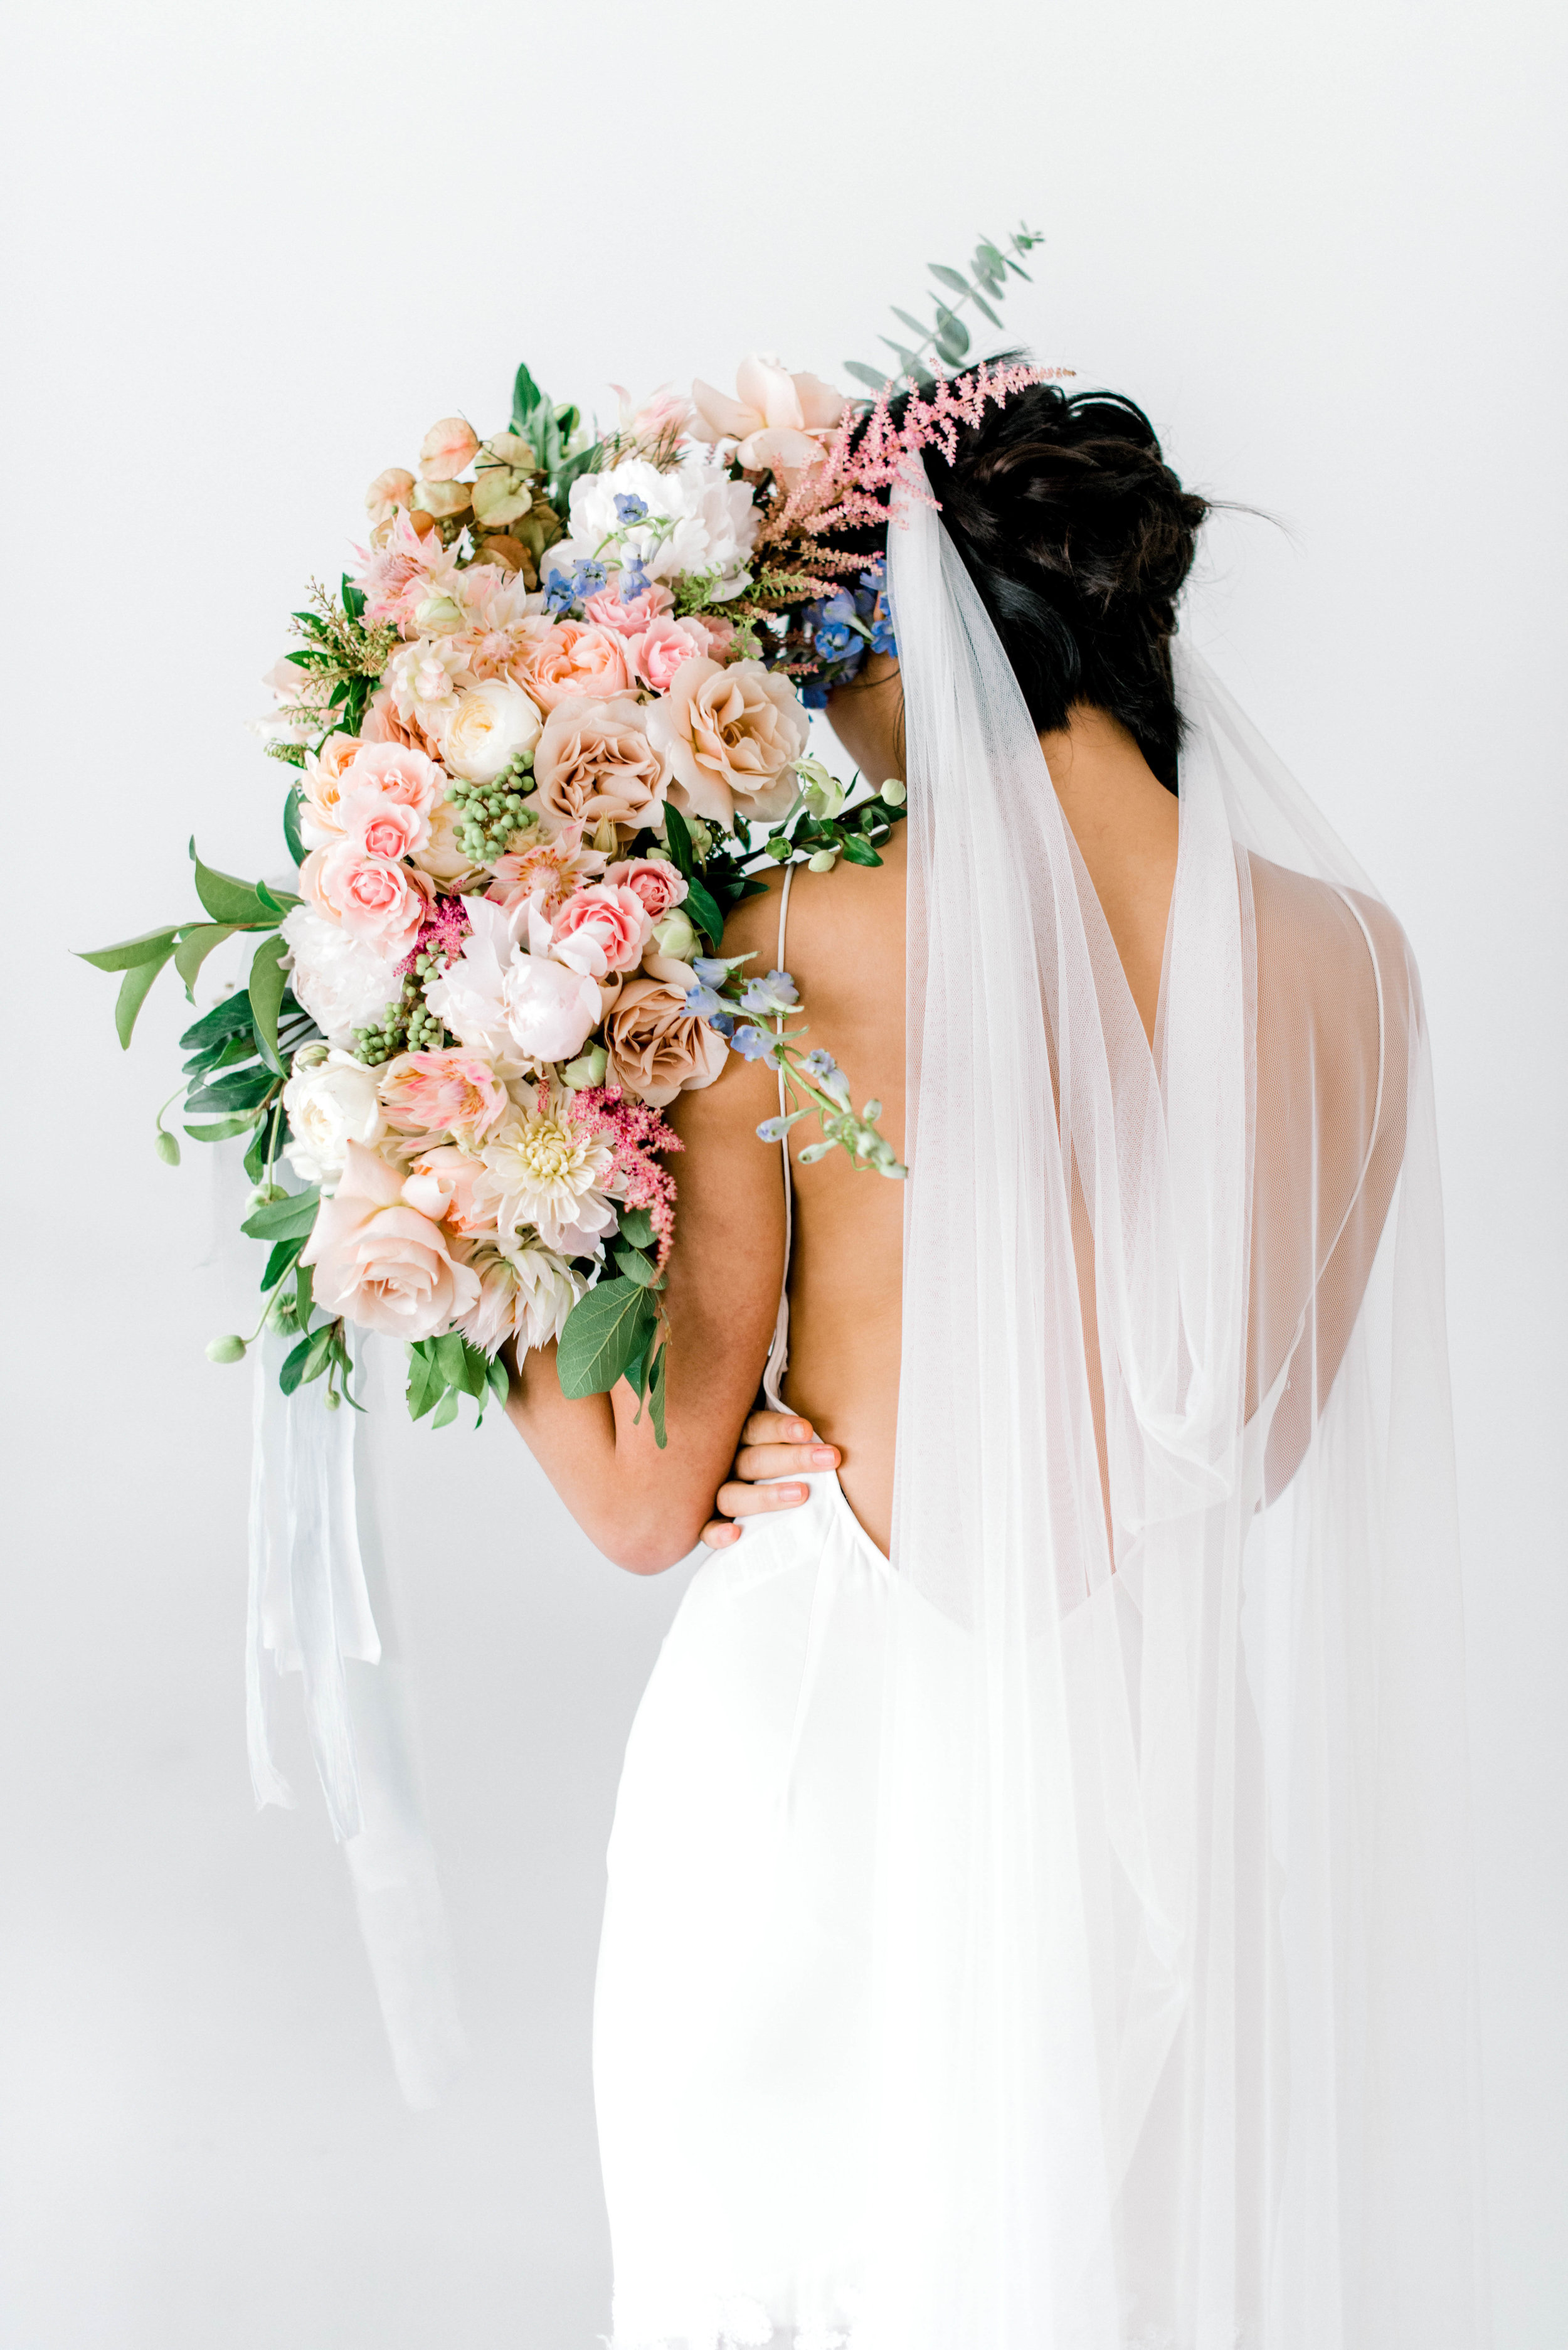 Houston-Wedding-Photographer-Editorial-Fine-Art-Film-Destination-Dallas-Texas-Mibellarosa-Josh-Dana-Fernandez-Photography-12.jpg